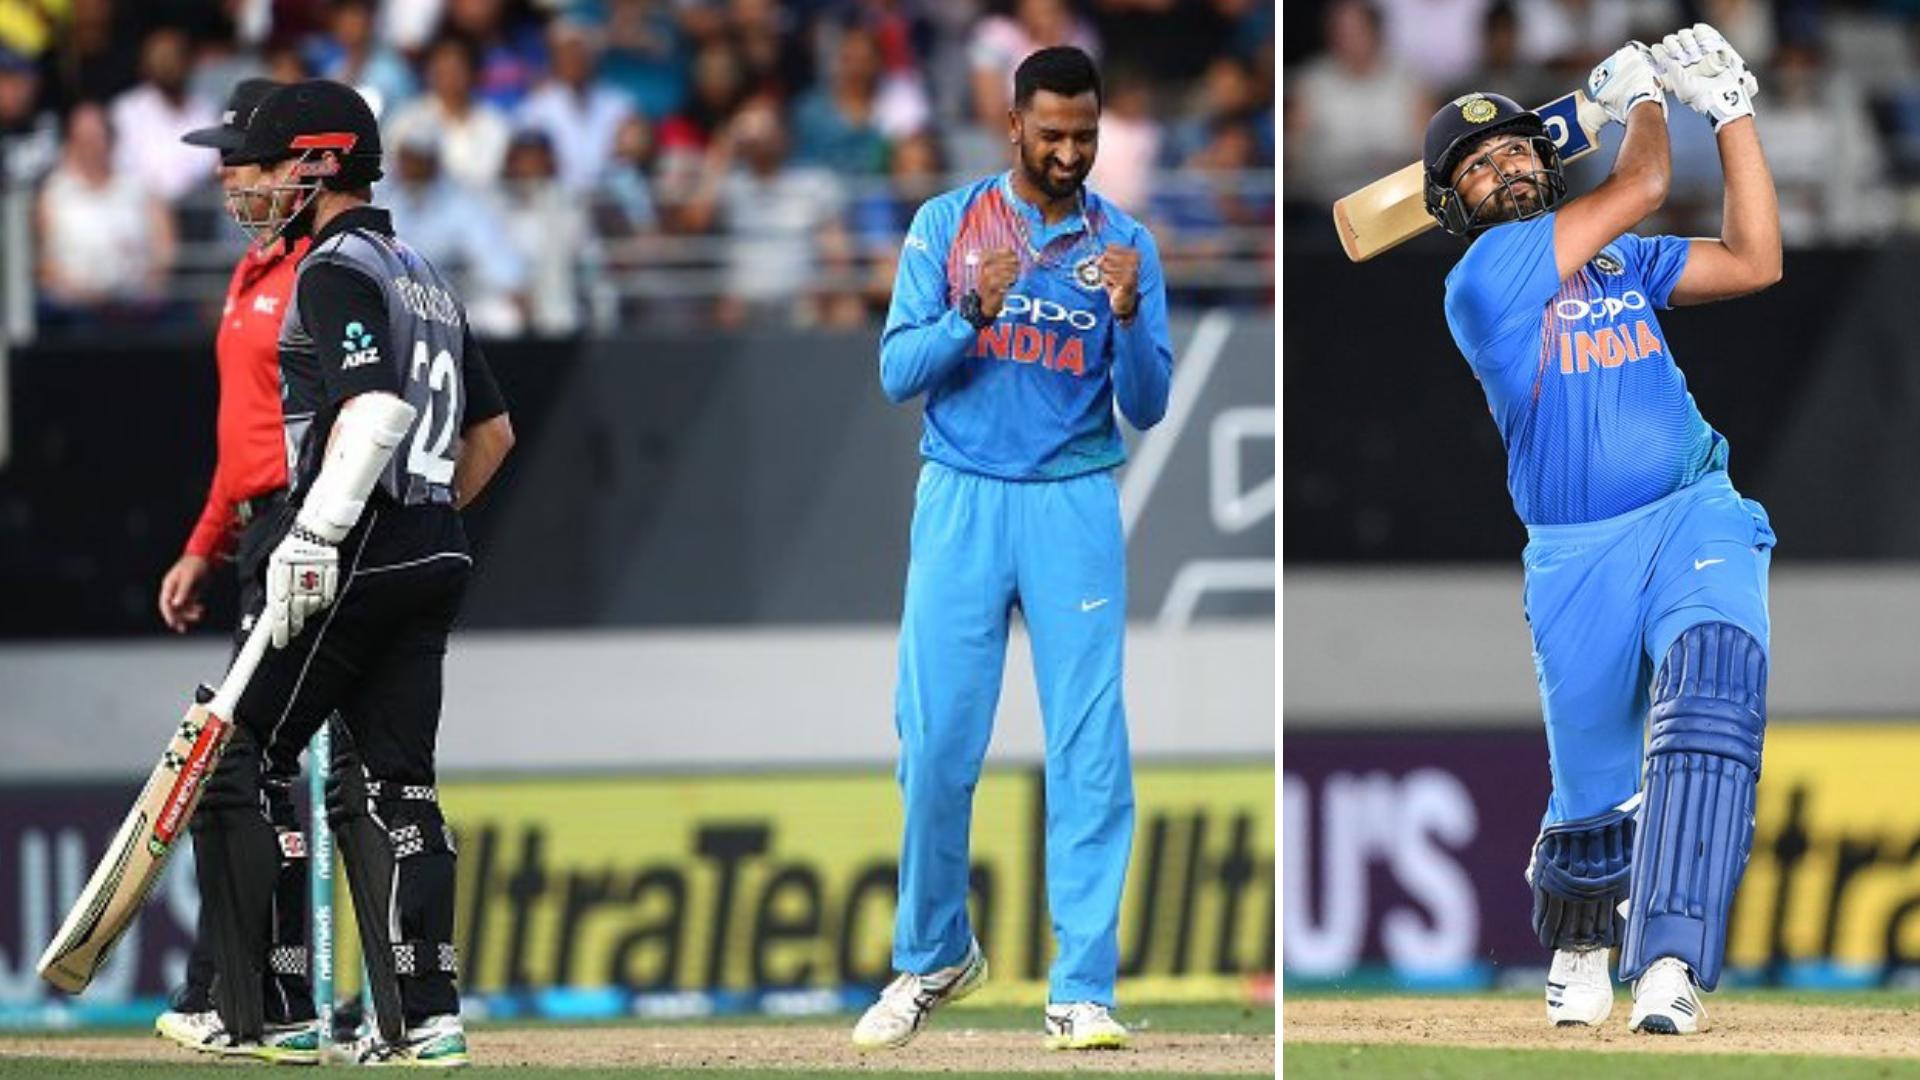 India Vs New Zealand 2nd T20i Krunal Rohit Star As India